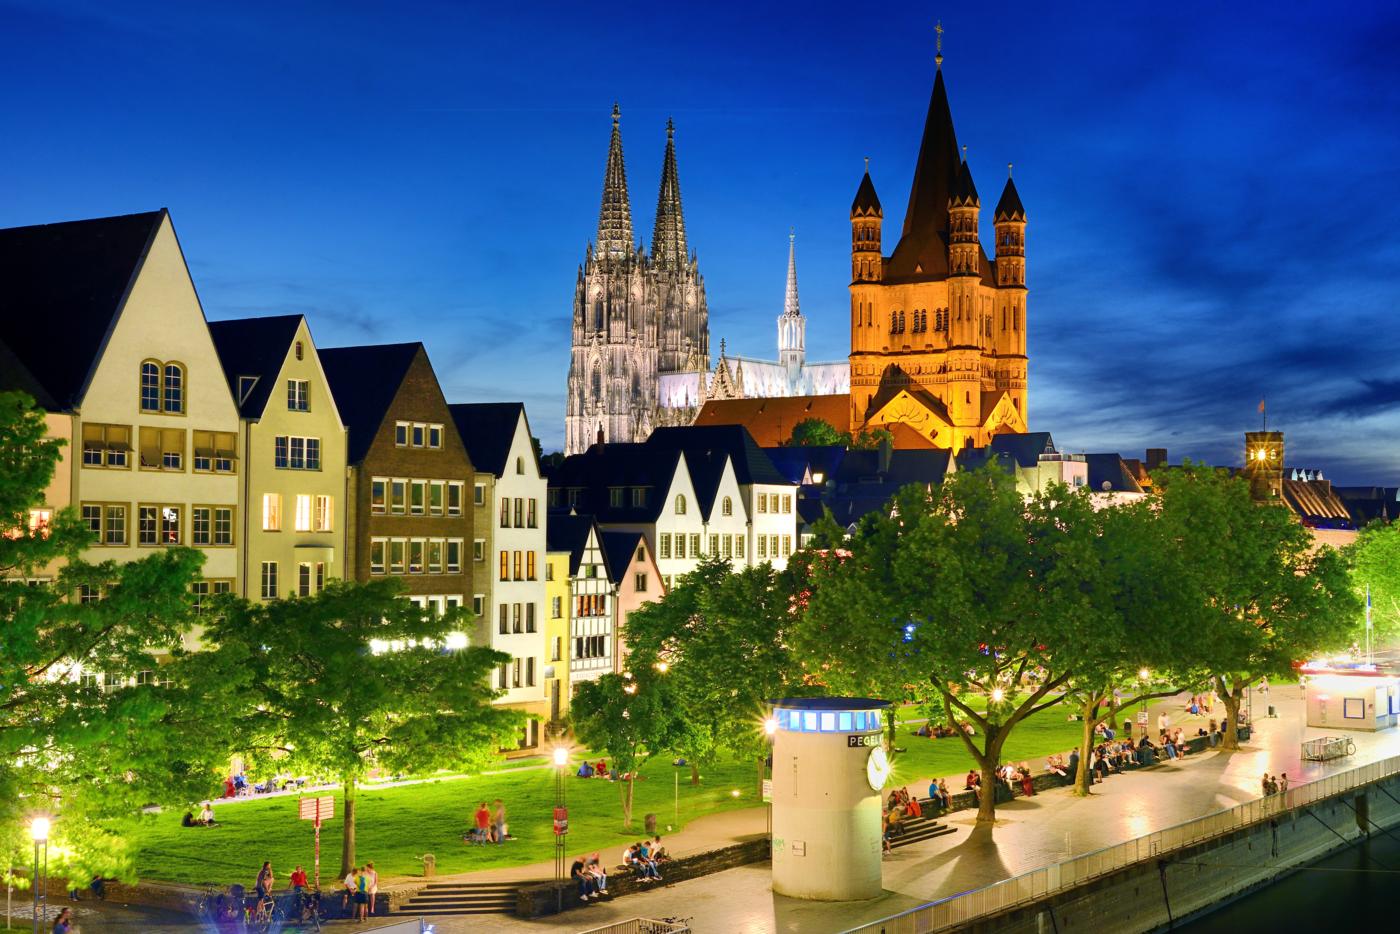 Colonia, panoramica día, Alemania, crucero Rin